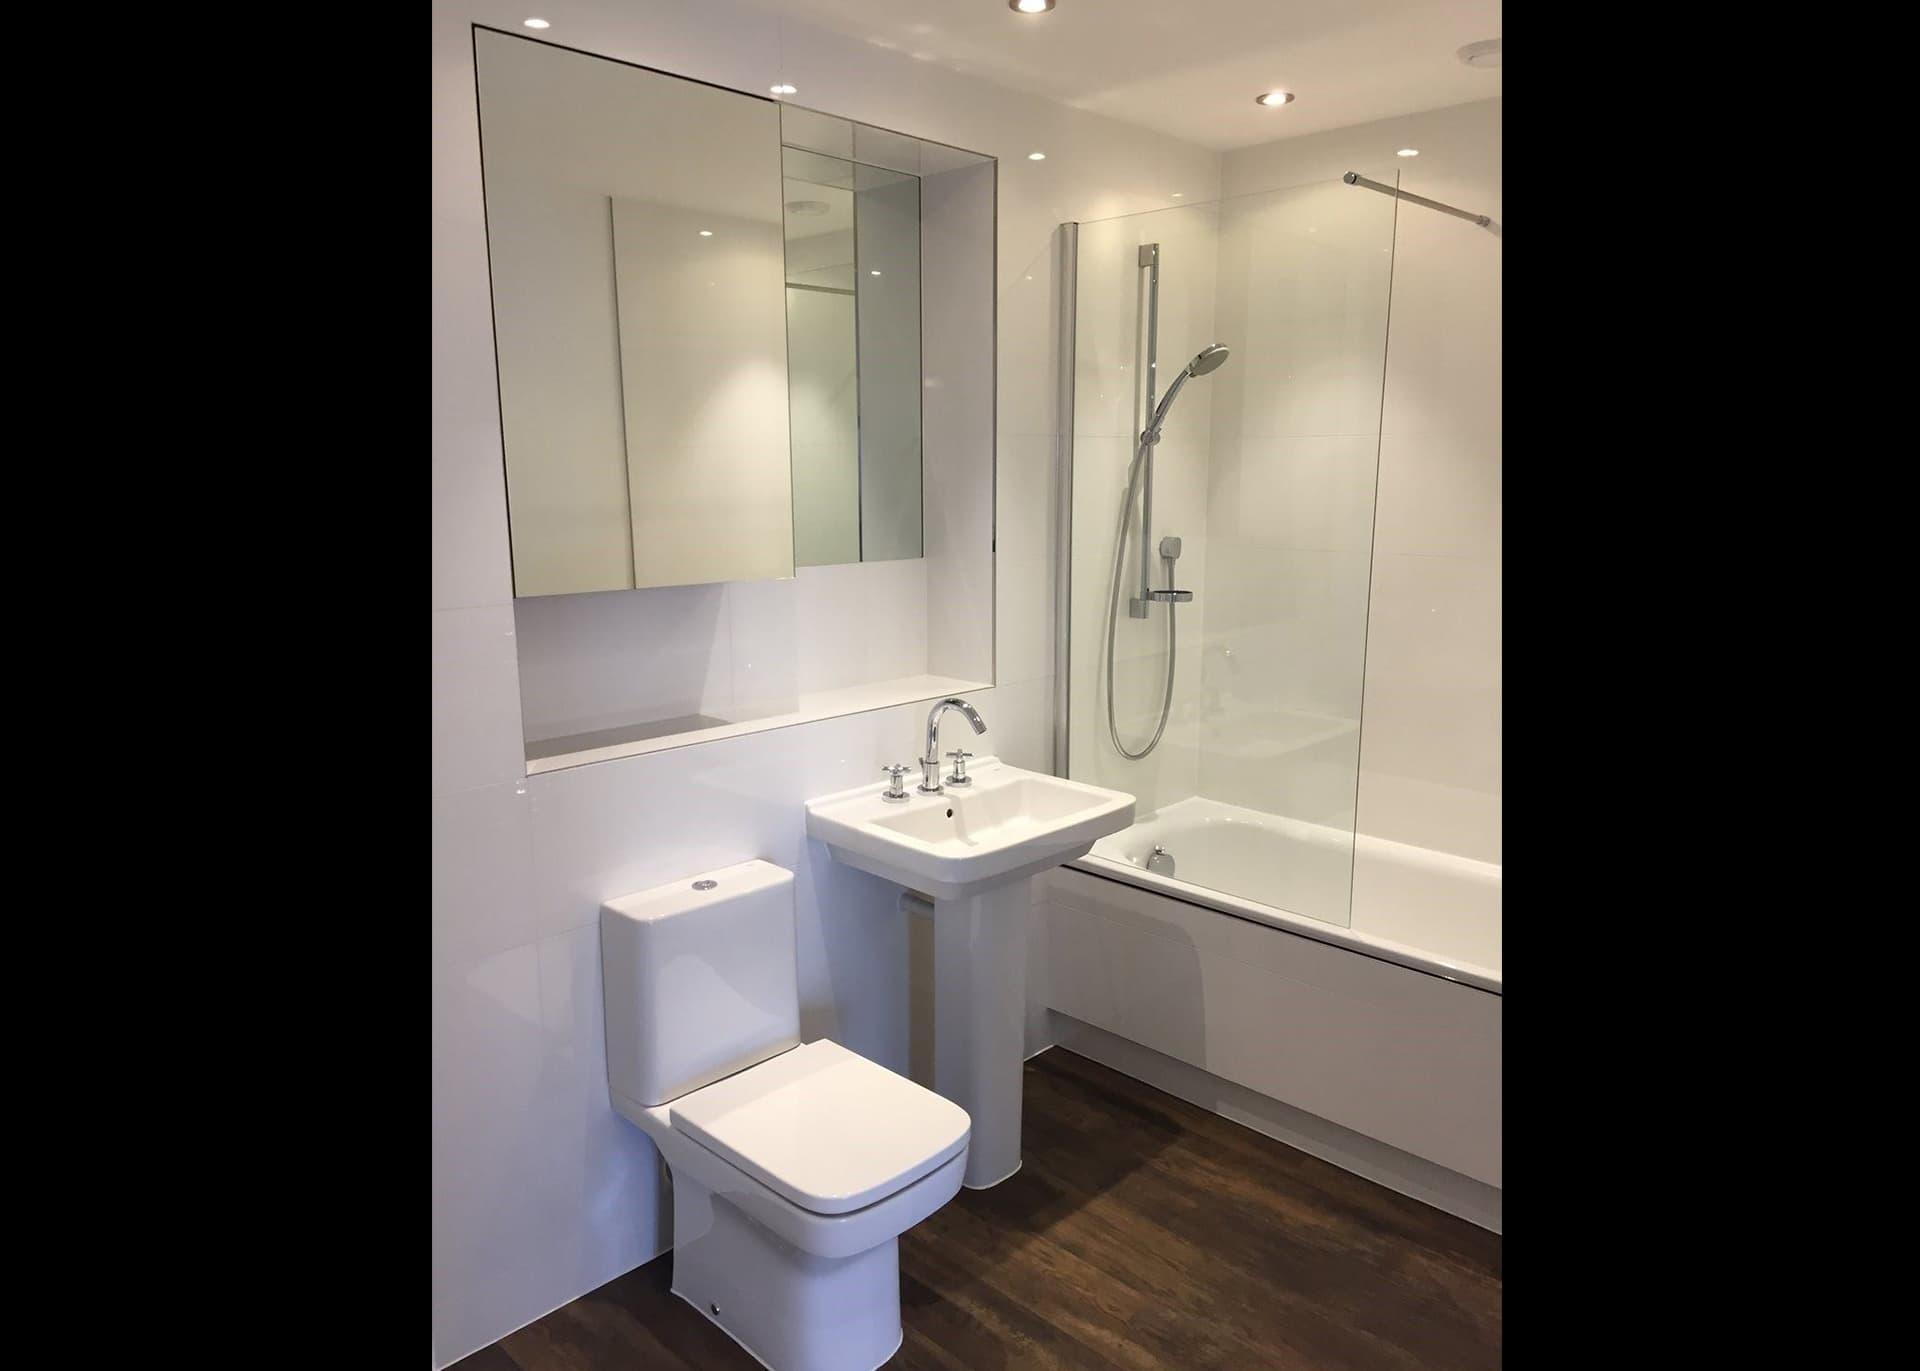 Apartment A702 Westmount bathroom